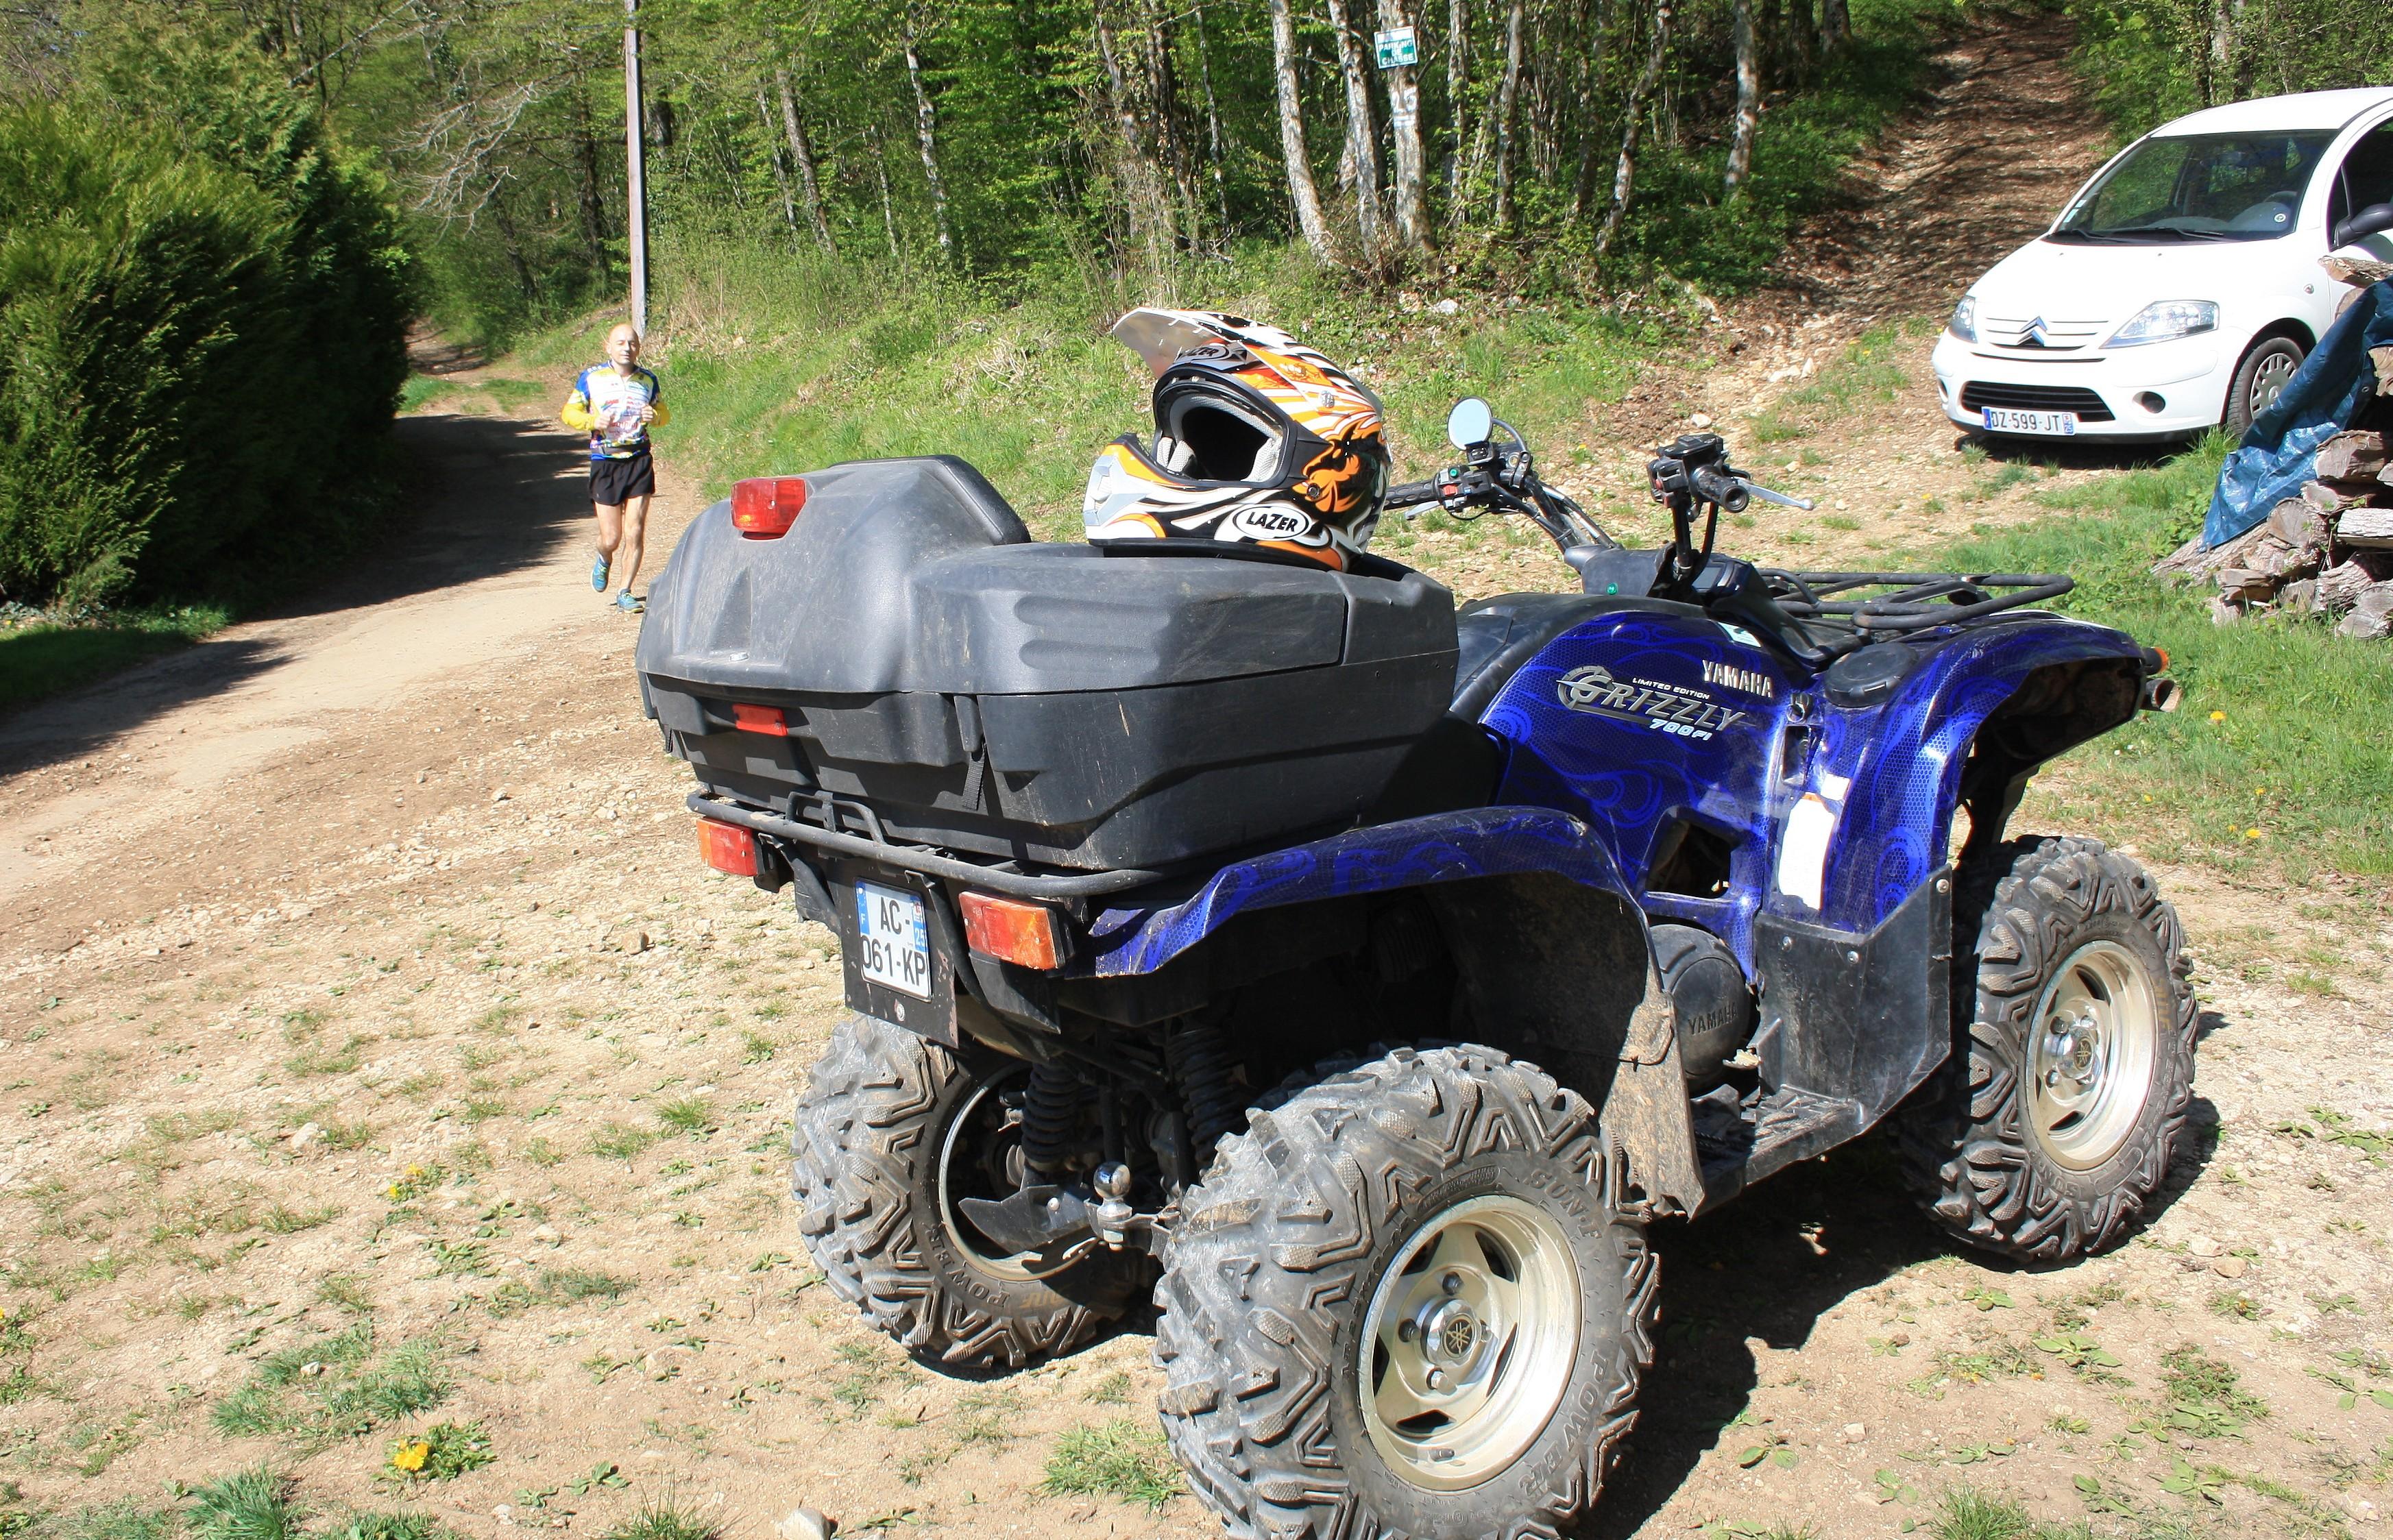 2017-04-09 - Trail-Montfaucon (320)